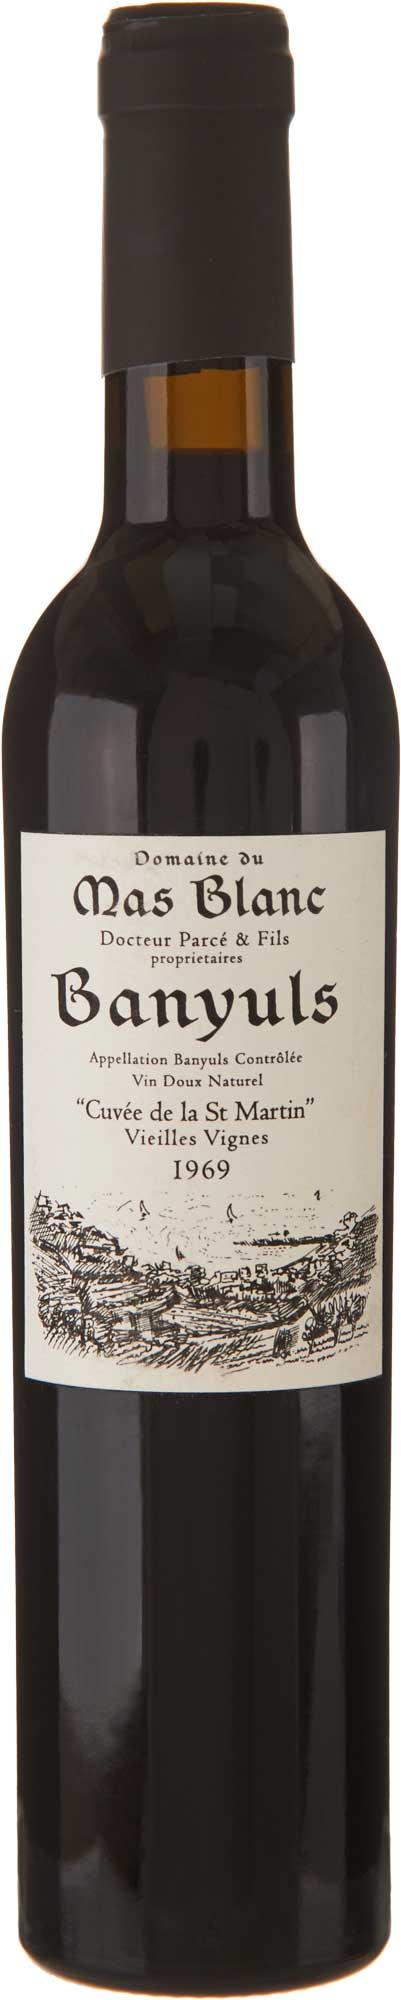 "Domaine du Mas Blanc Banyuls ""Cuvée St. Martin"" 1969"